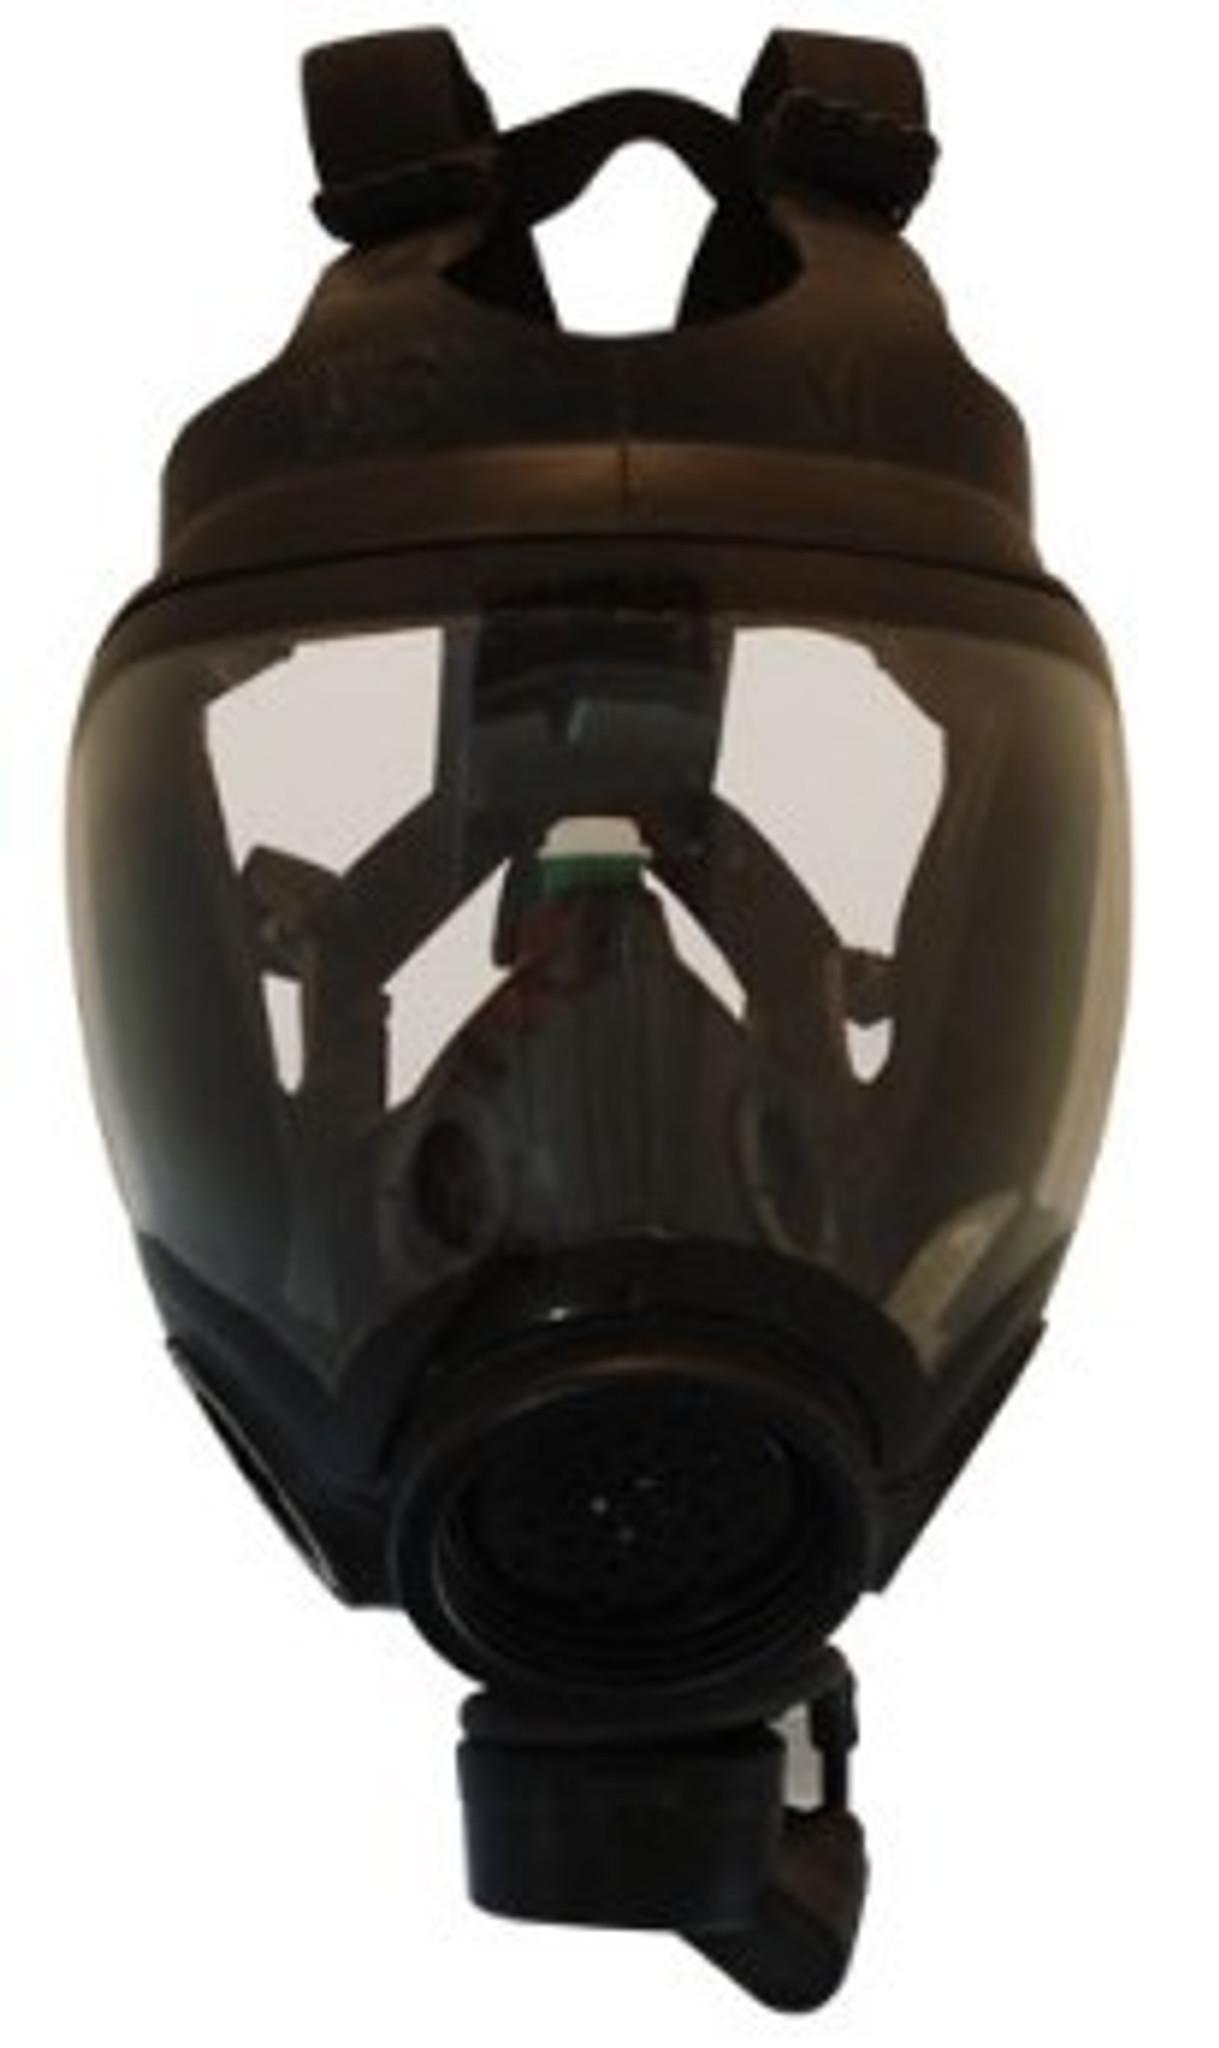 MSA #10051287 Millennium CBRN Gas Mask